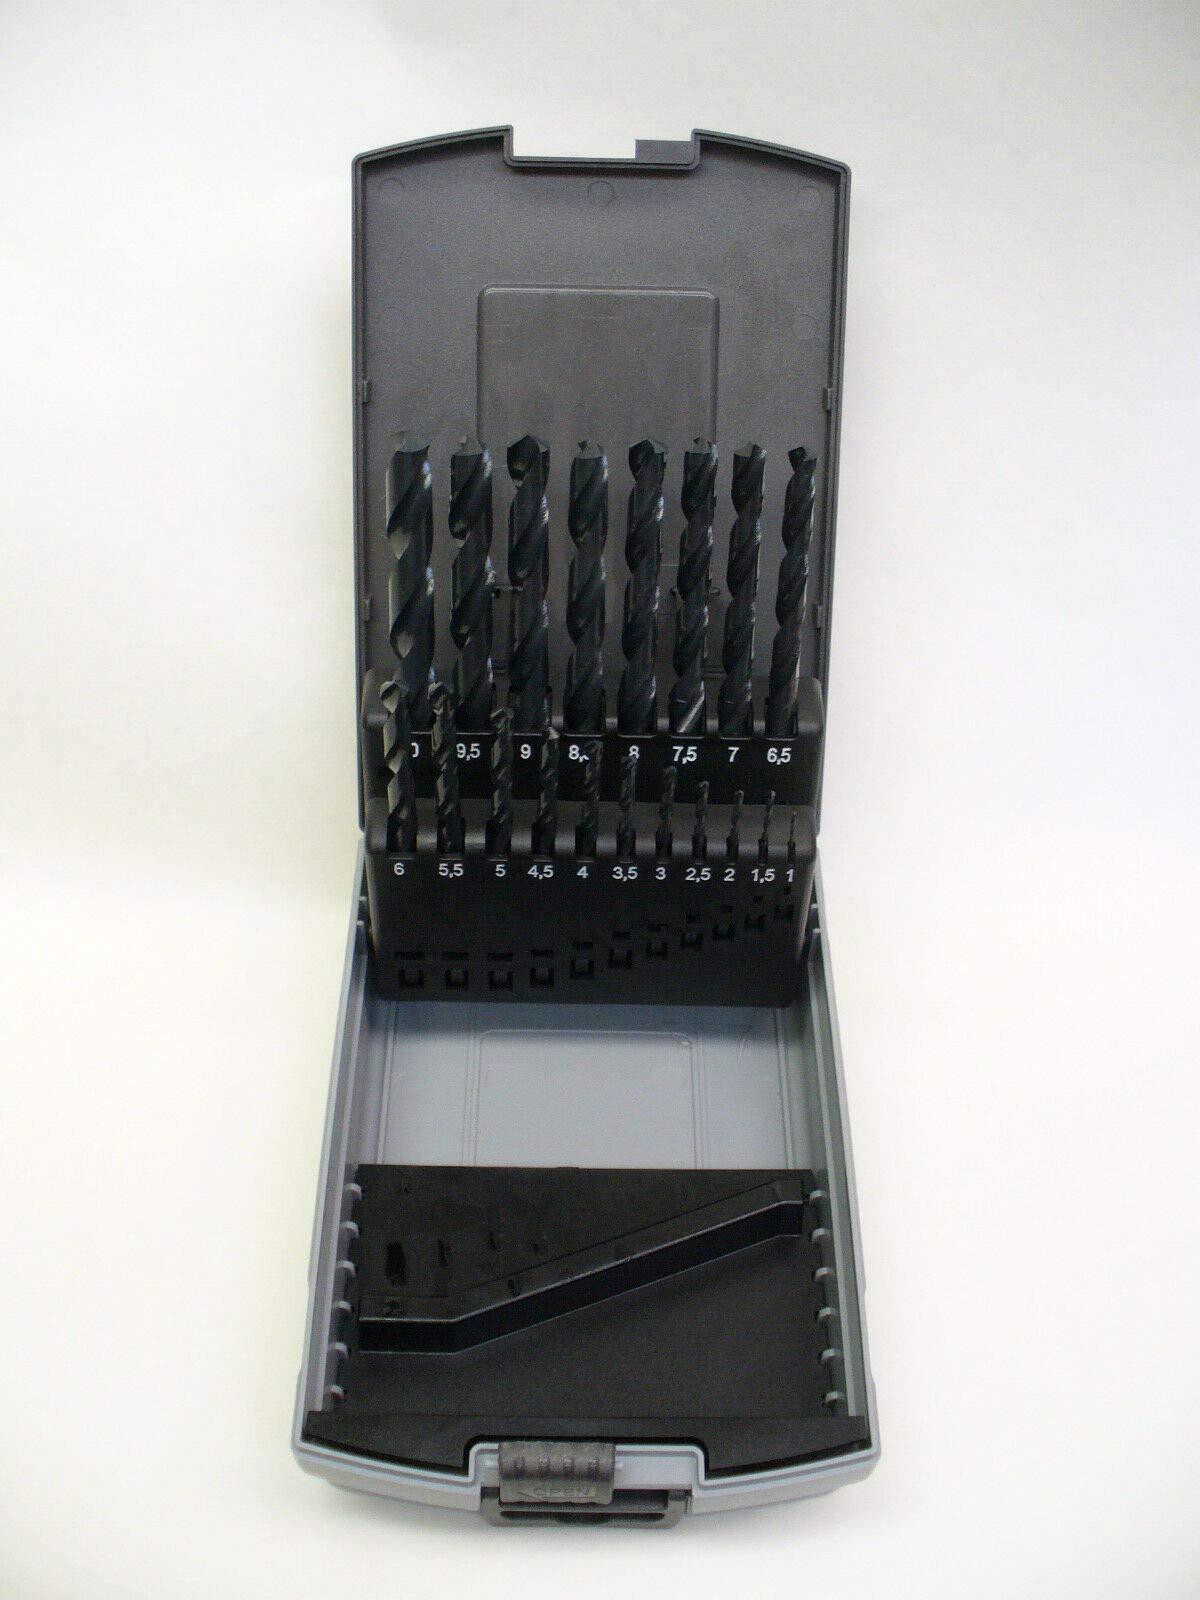 TNPSHOP 19 PIECE METRIC DRILL BIT SET HIGH SPEED STEEL 1-10mm BY .5mm INCREMENTS by TNPSHOP